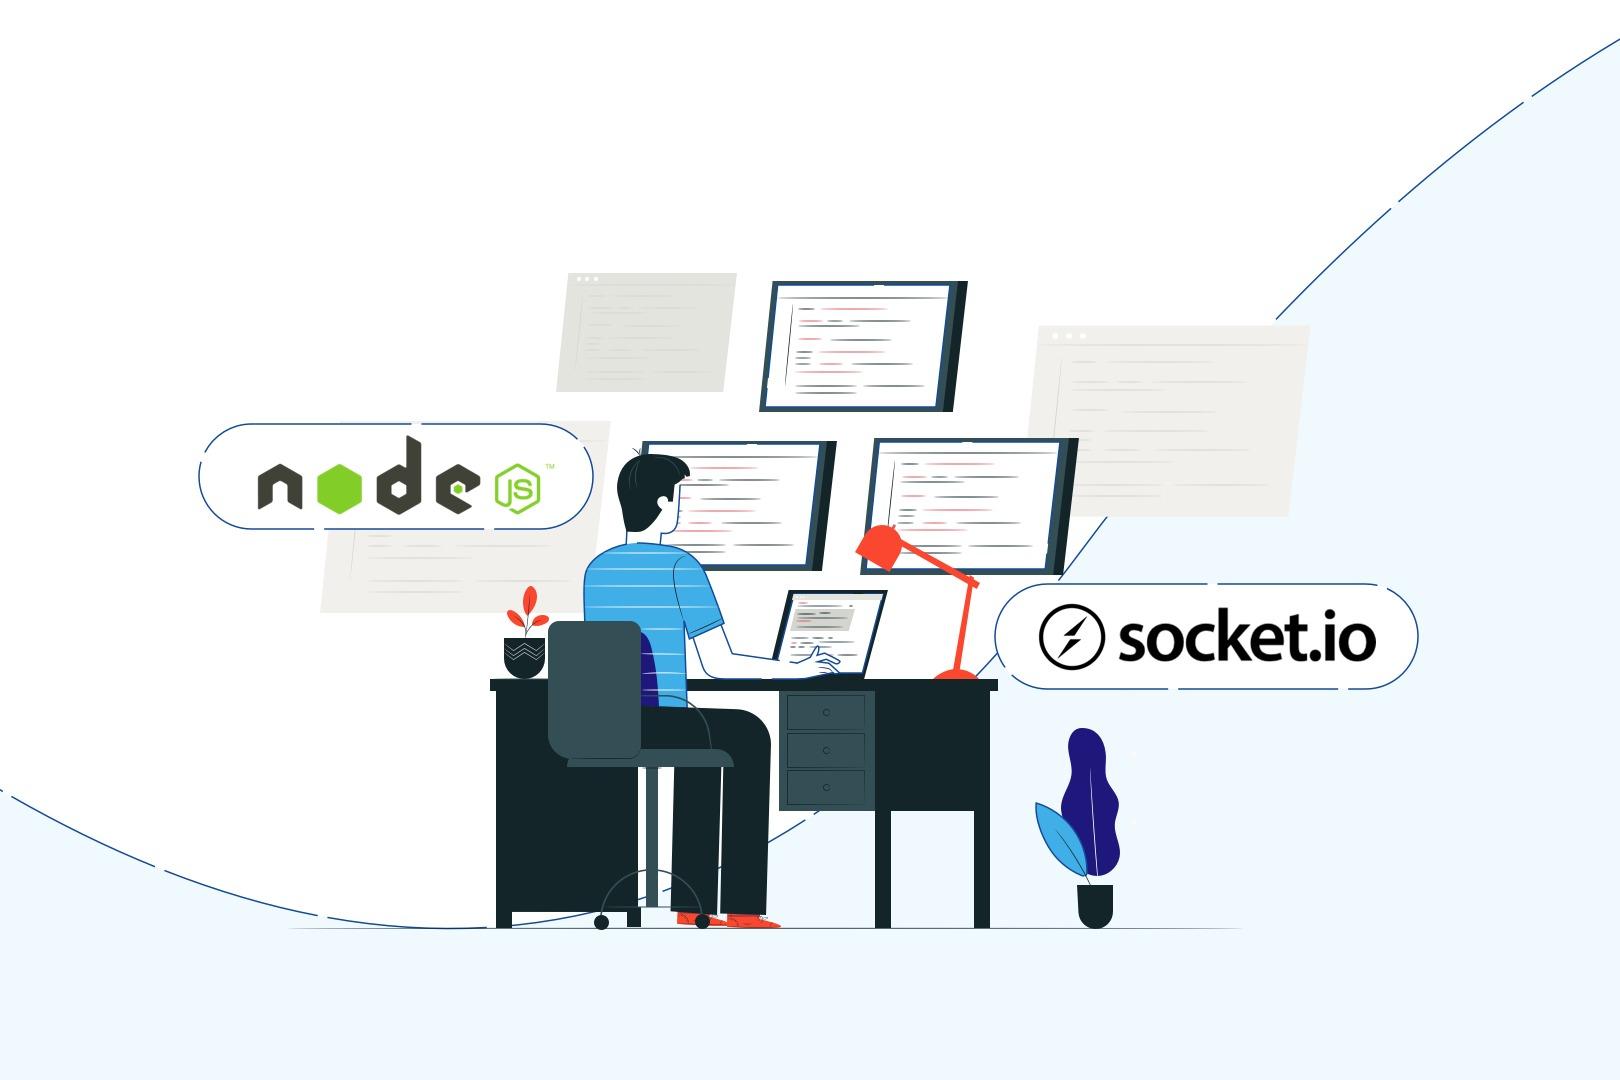 Socket.io tutorial: Real-time communication in web development